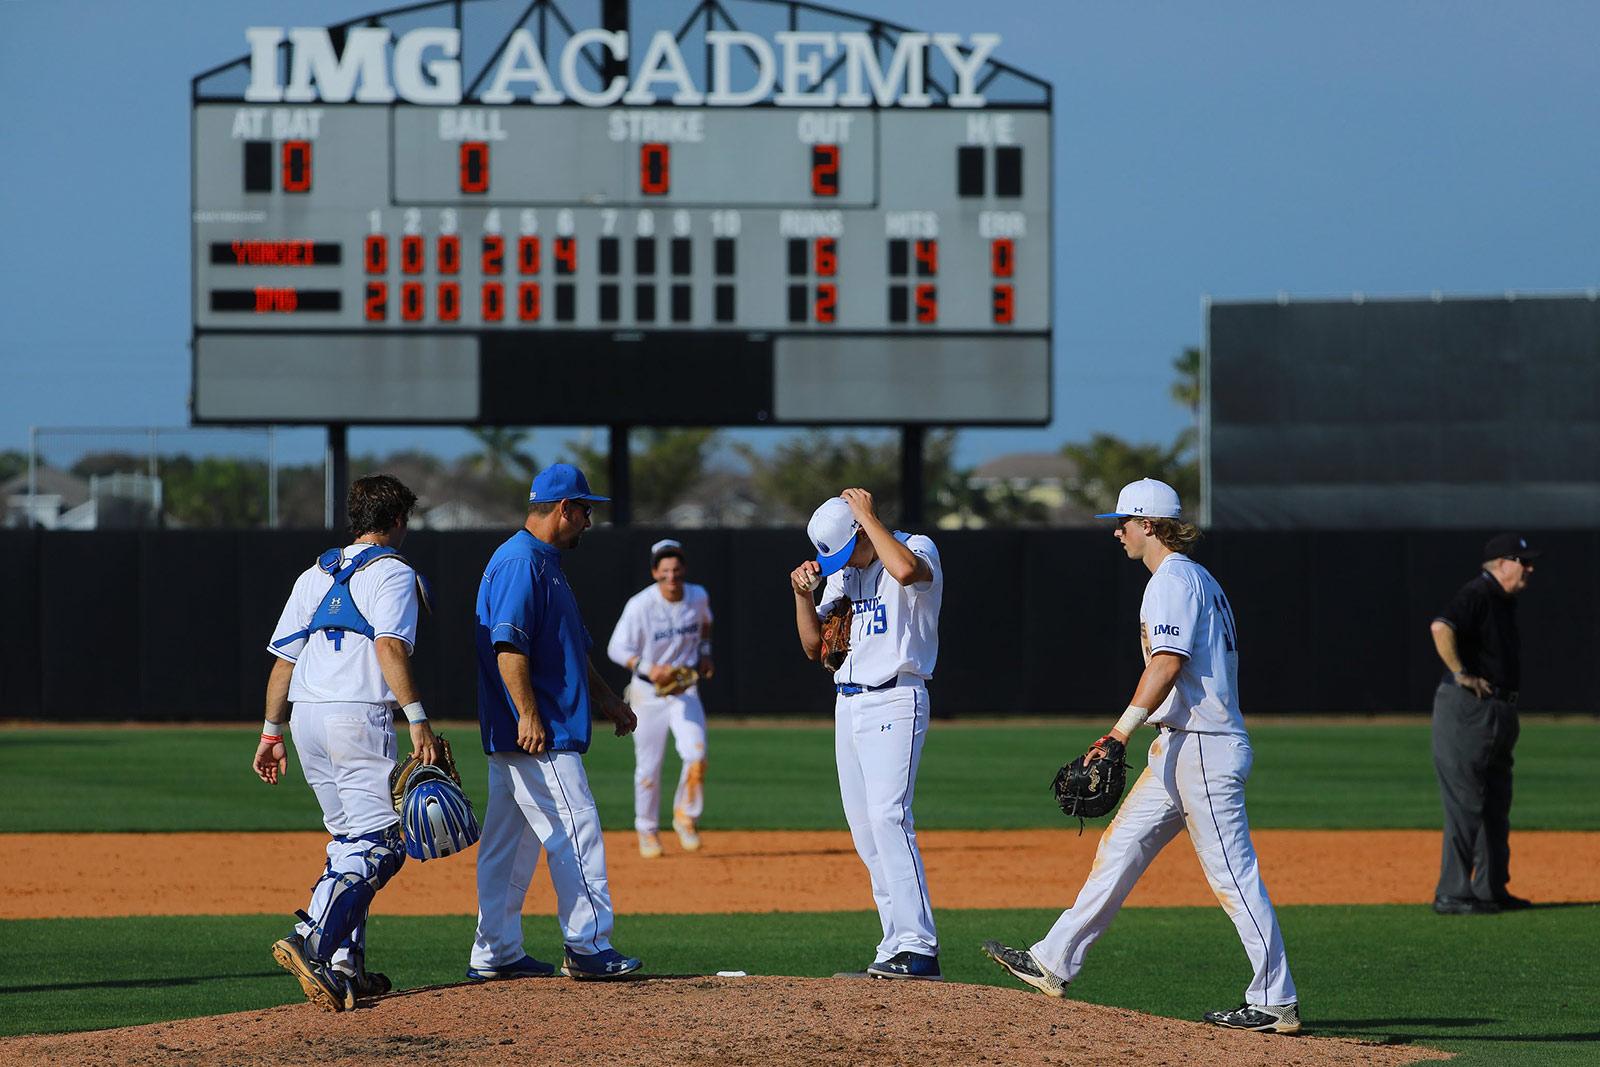 img academy stadium